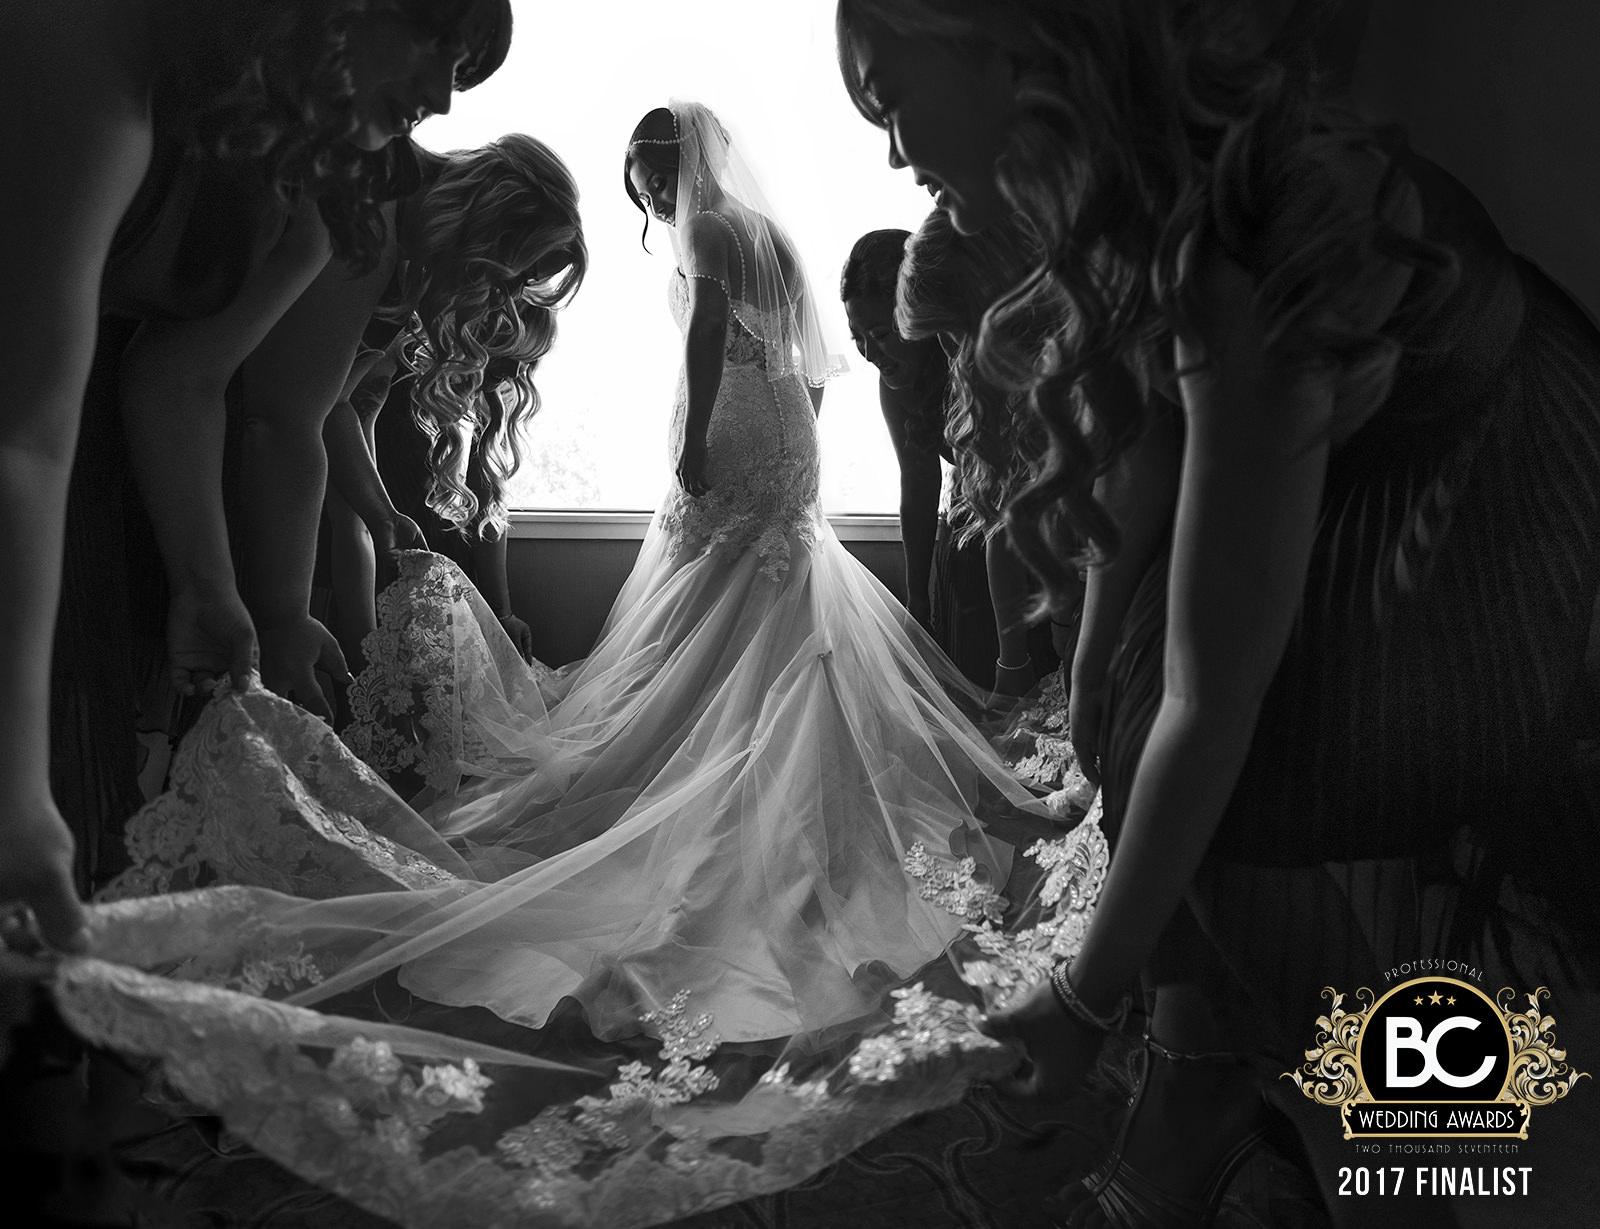 BC wedding awards finalist detail shot bride backlit by window